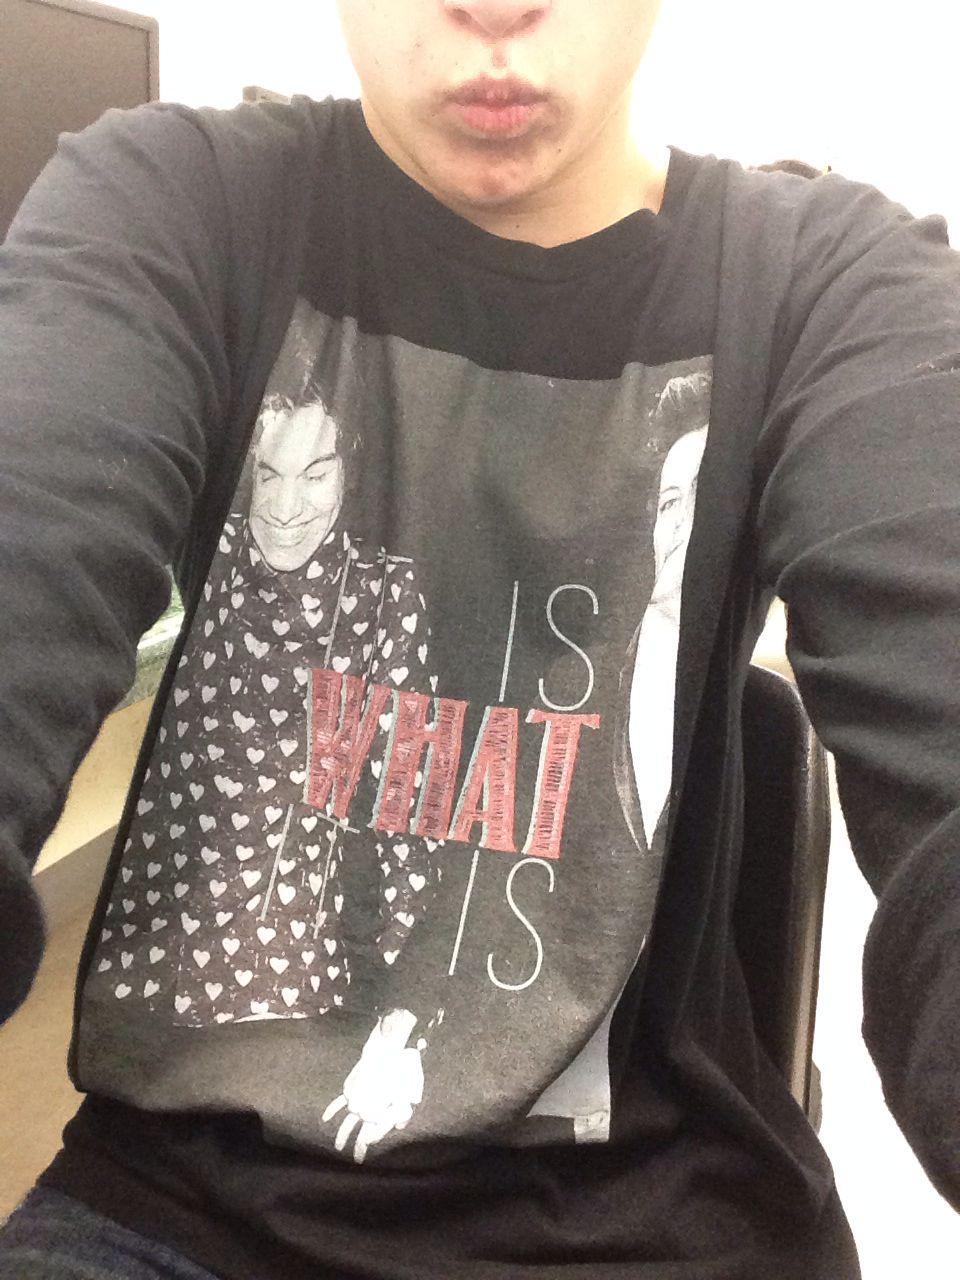 My fave shirt